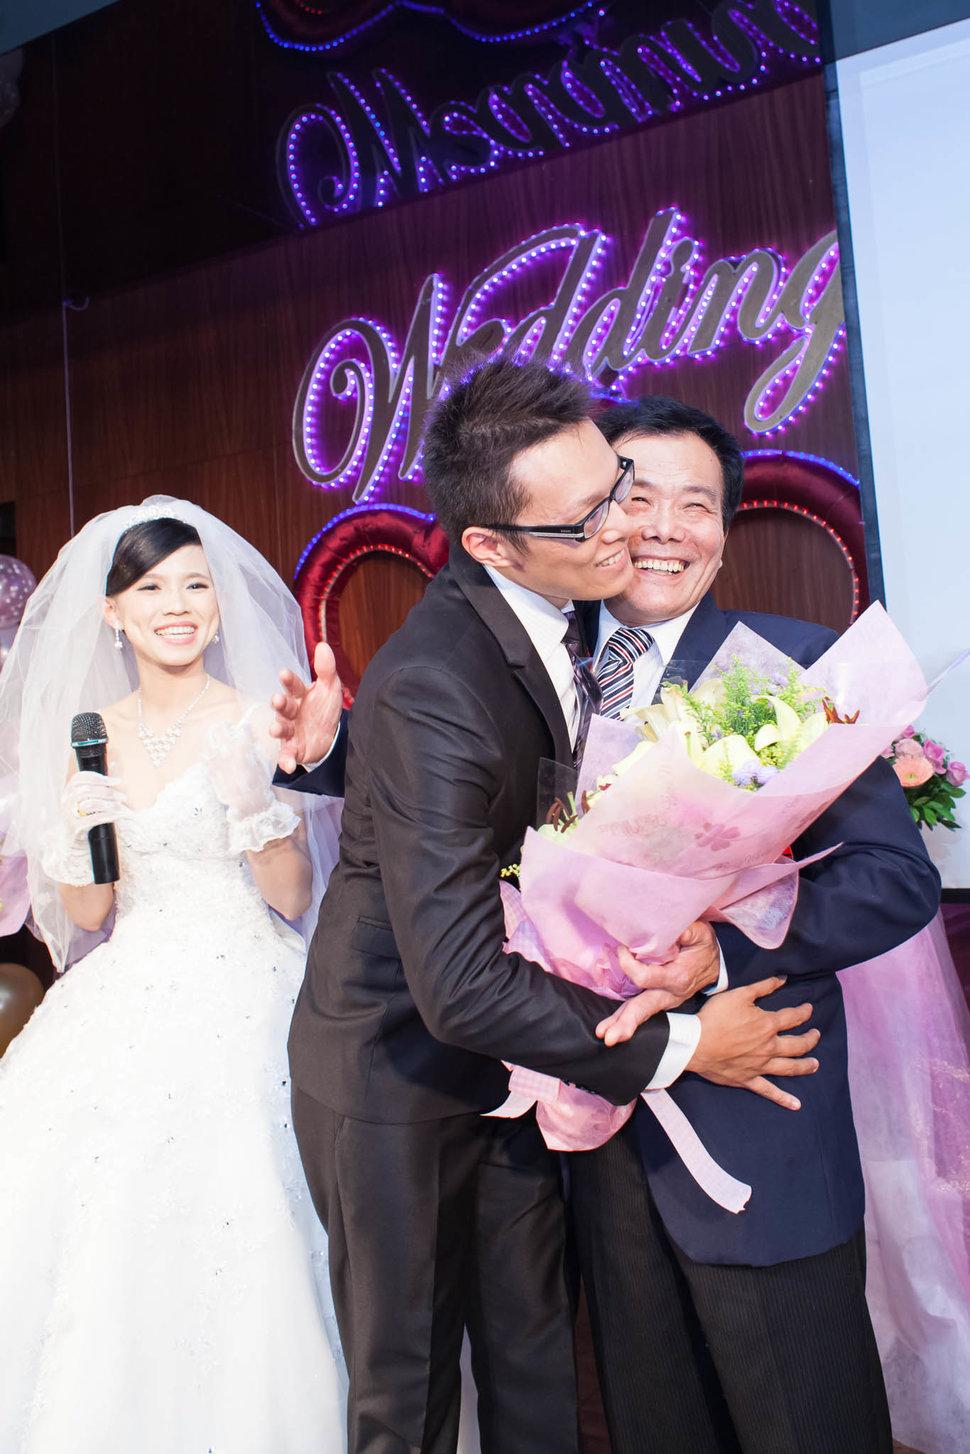 18PHOTO-青蛙王子娶新娘❤️(編號:218645) - 18PHOTO 婚紗影像攝影工作室 - 結婚吧一站式婚禮服務平台